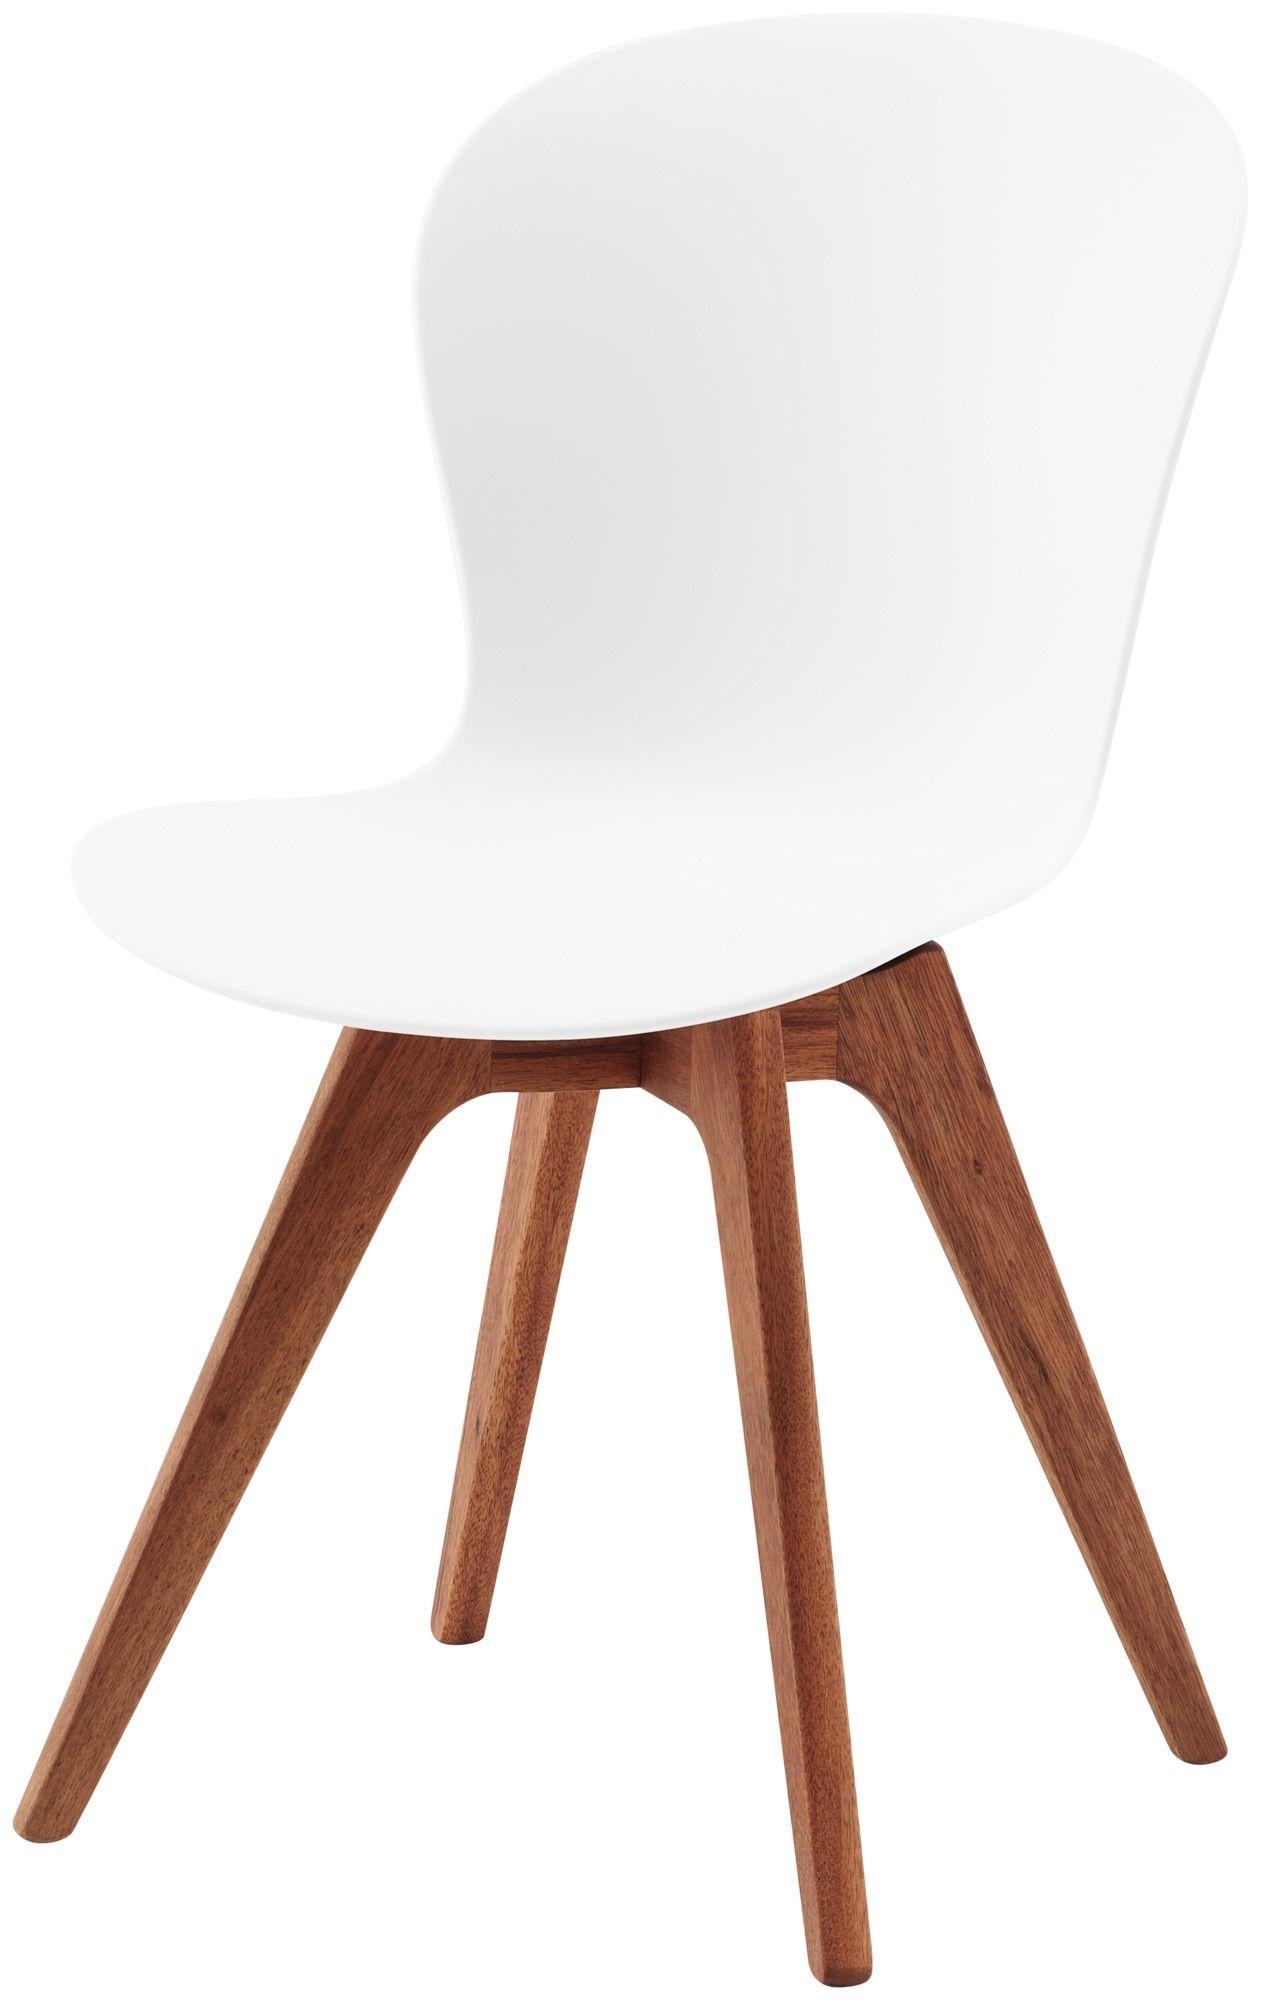 Moderne Design Gartenmöbel online kaufen   BoConcept®   Living ...